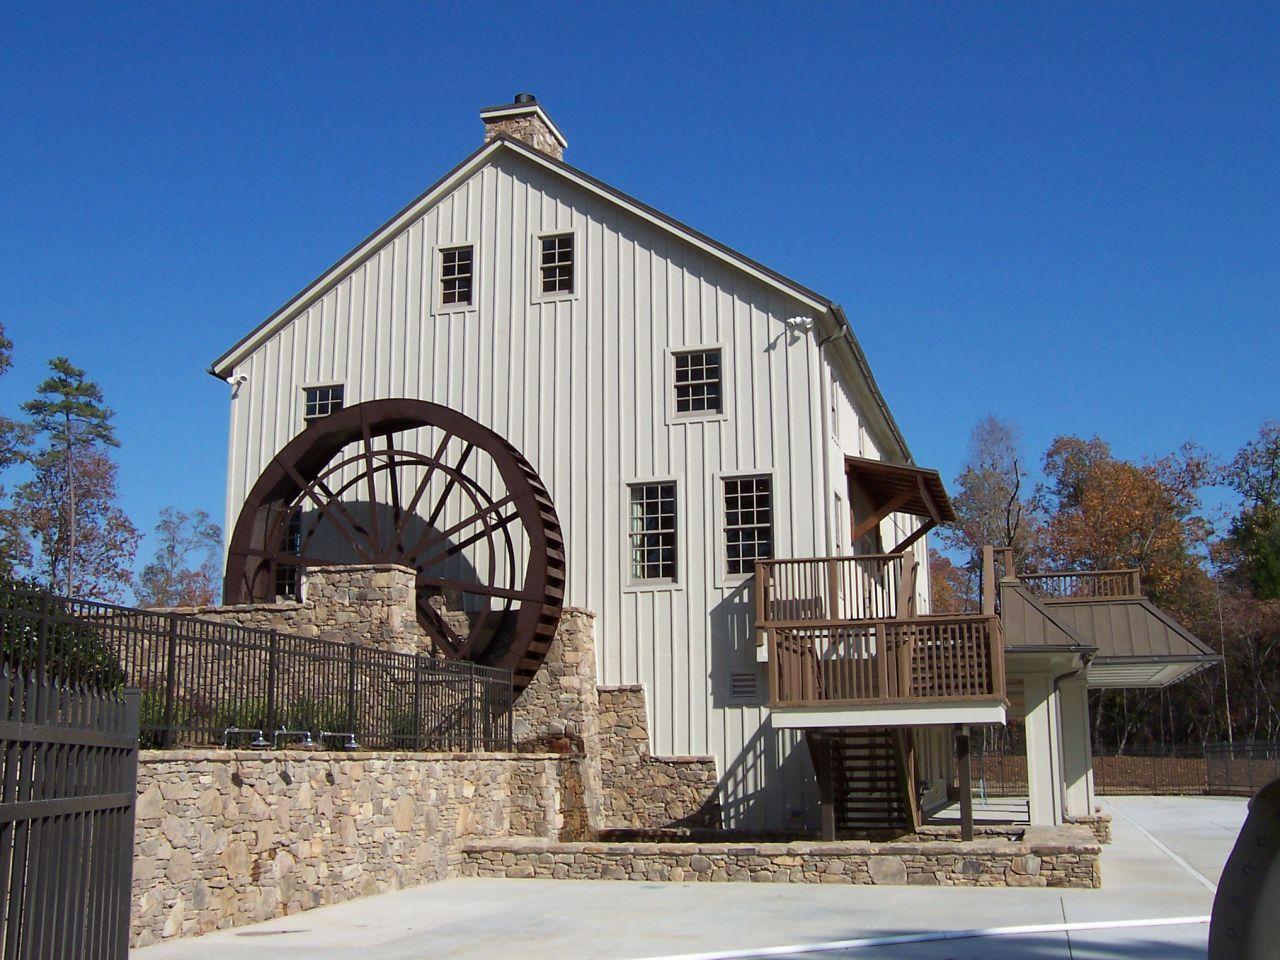 Millhouse at Lawson